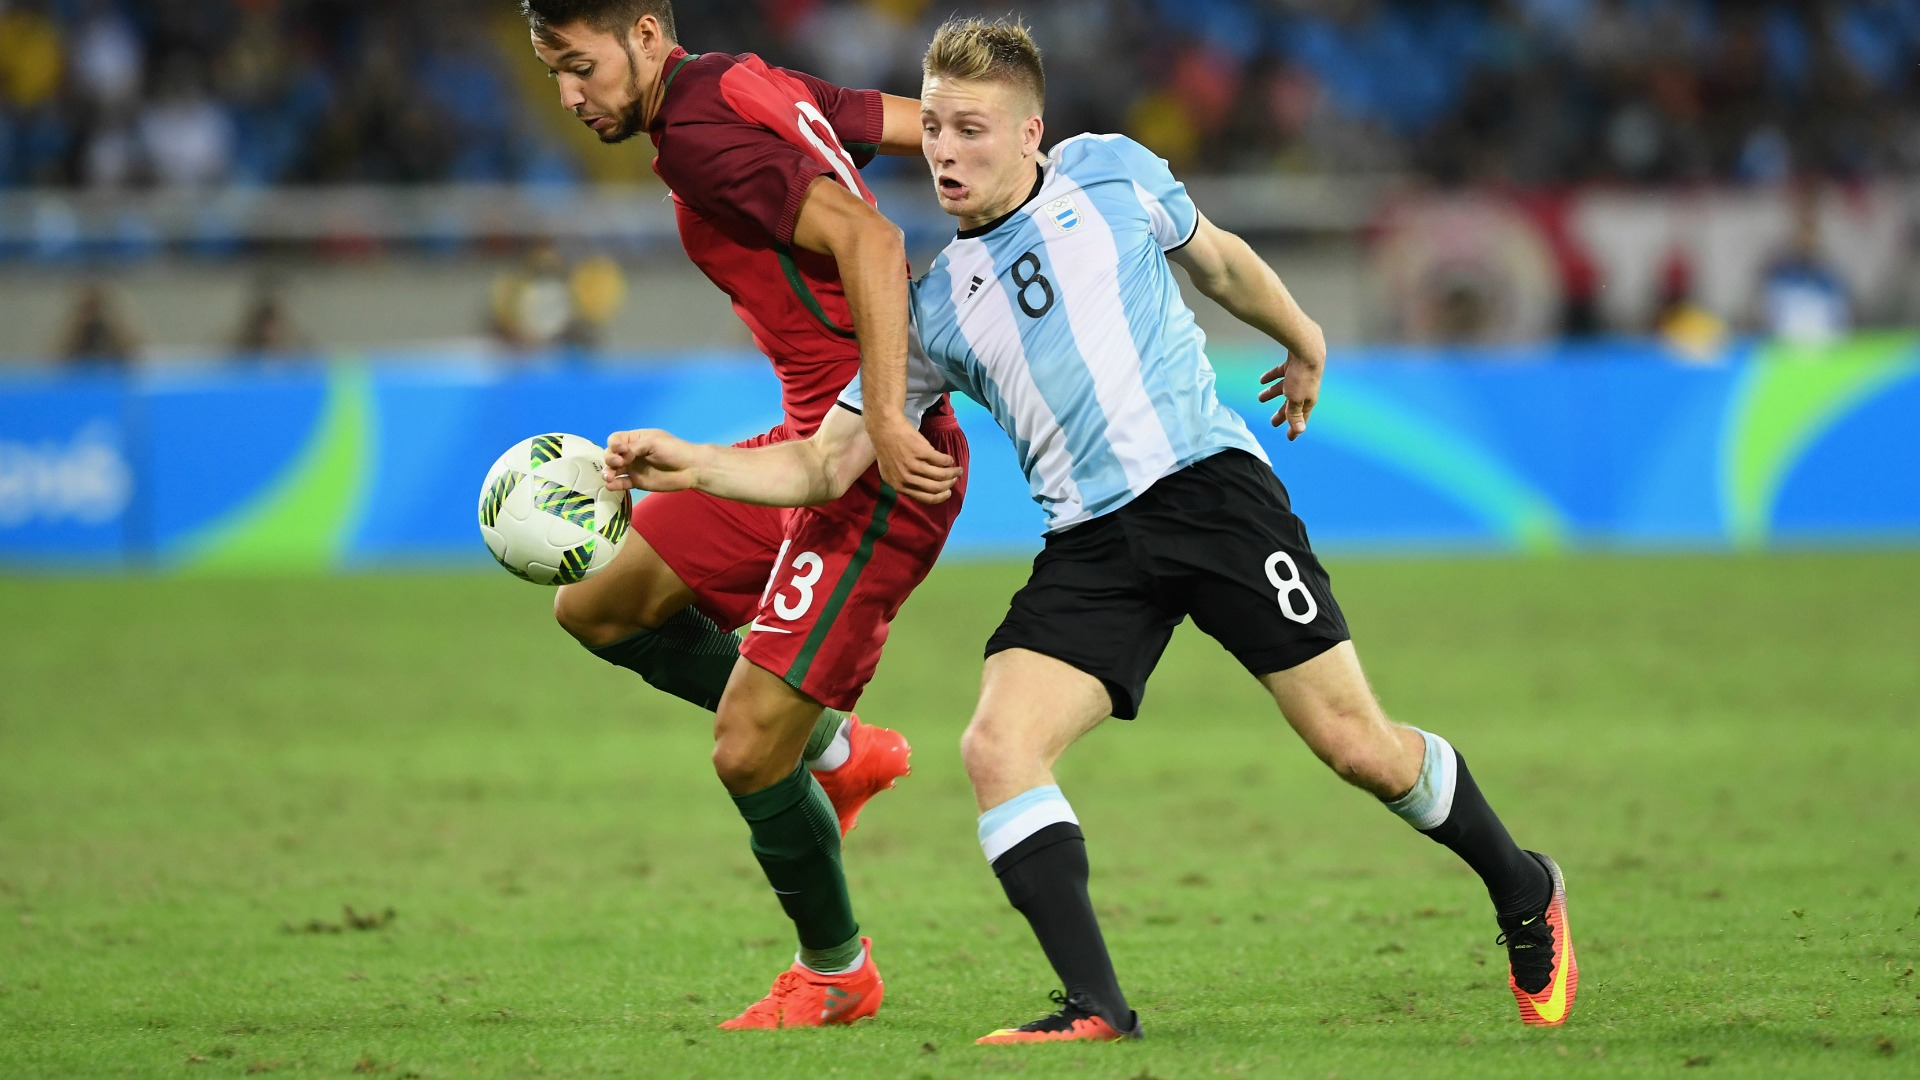 Football bets casino888 Santiago online-343565